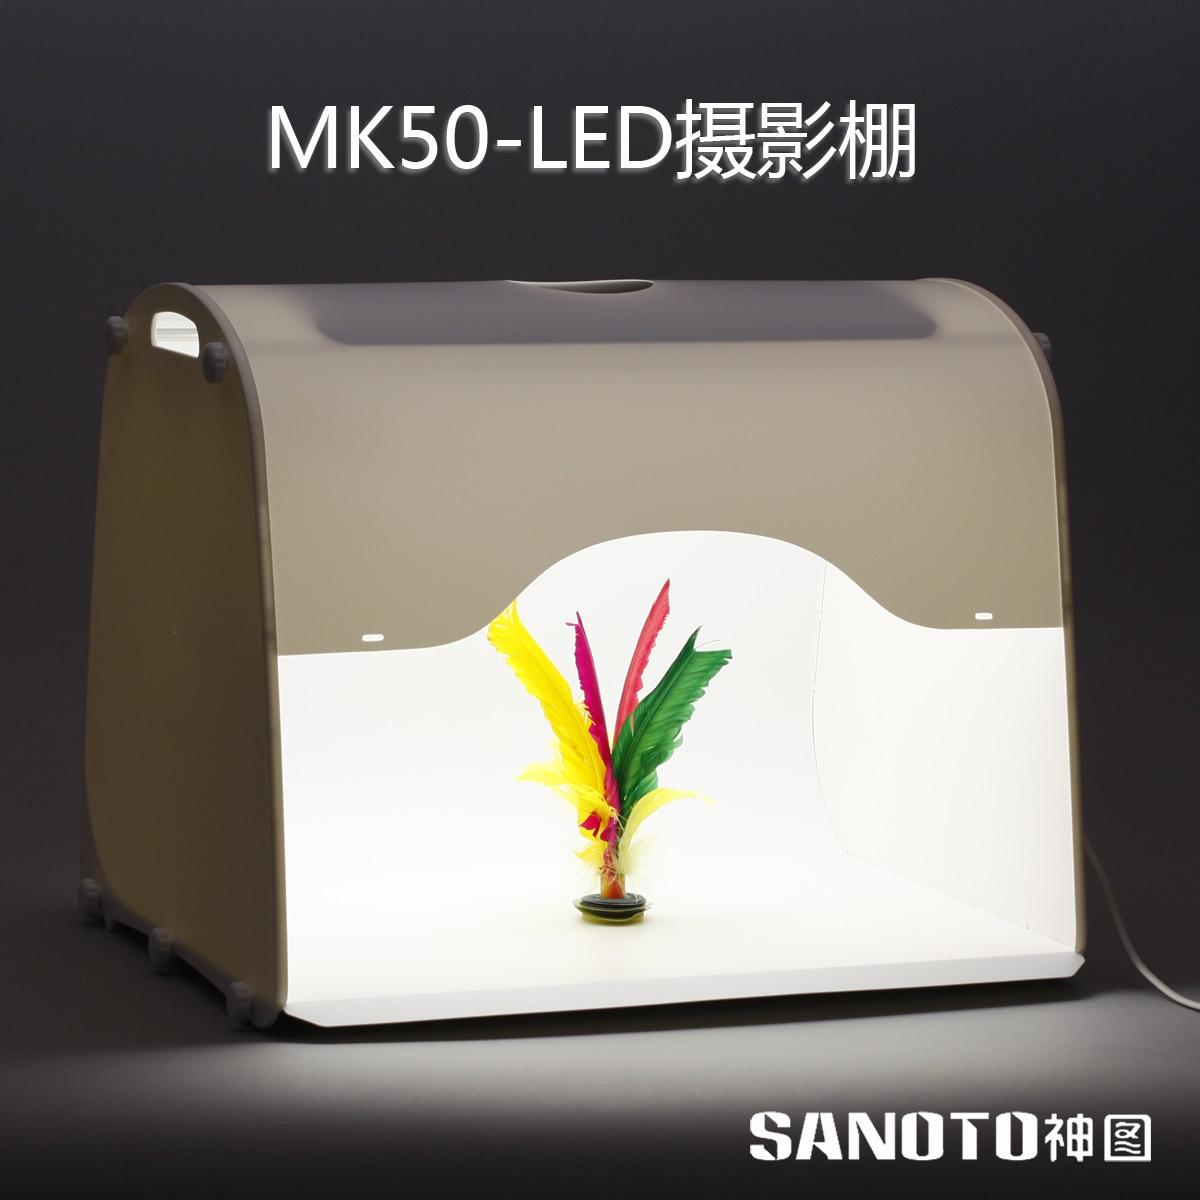 Adearstudio Studio BOX Mk50 LED Studio Kit Softbox photographie boîte à bijoux caméra boîte à lumière CD50